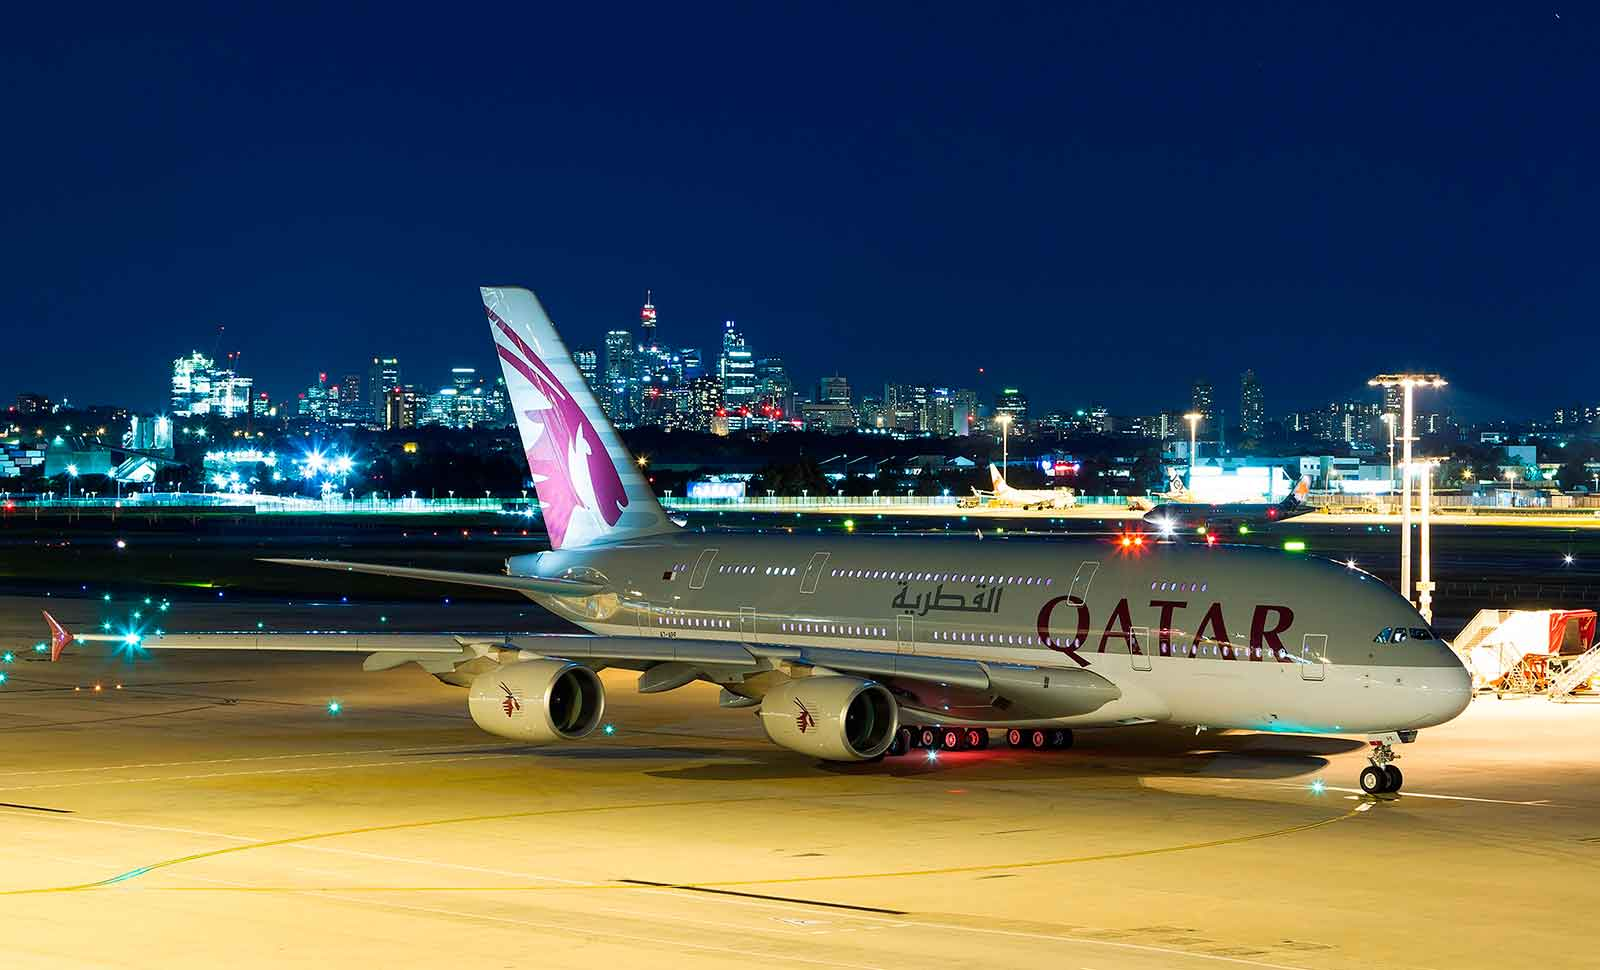 Qatar Airways A380 aircraft makes its Australian debut in Sydney